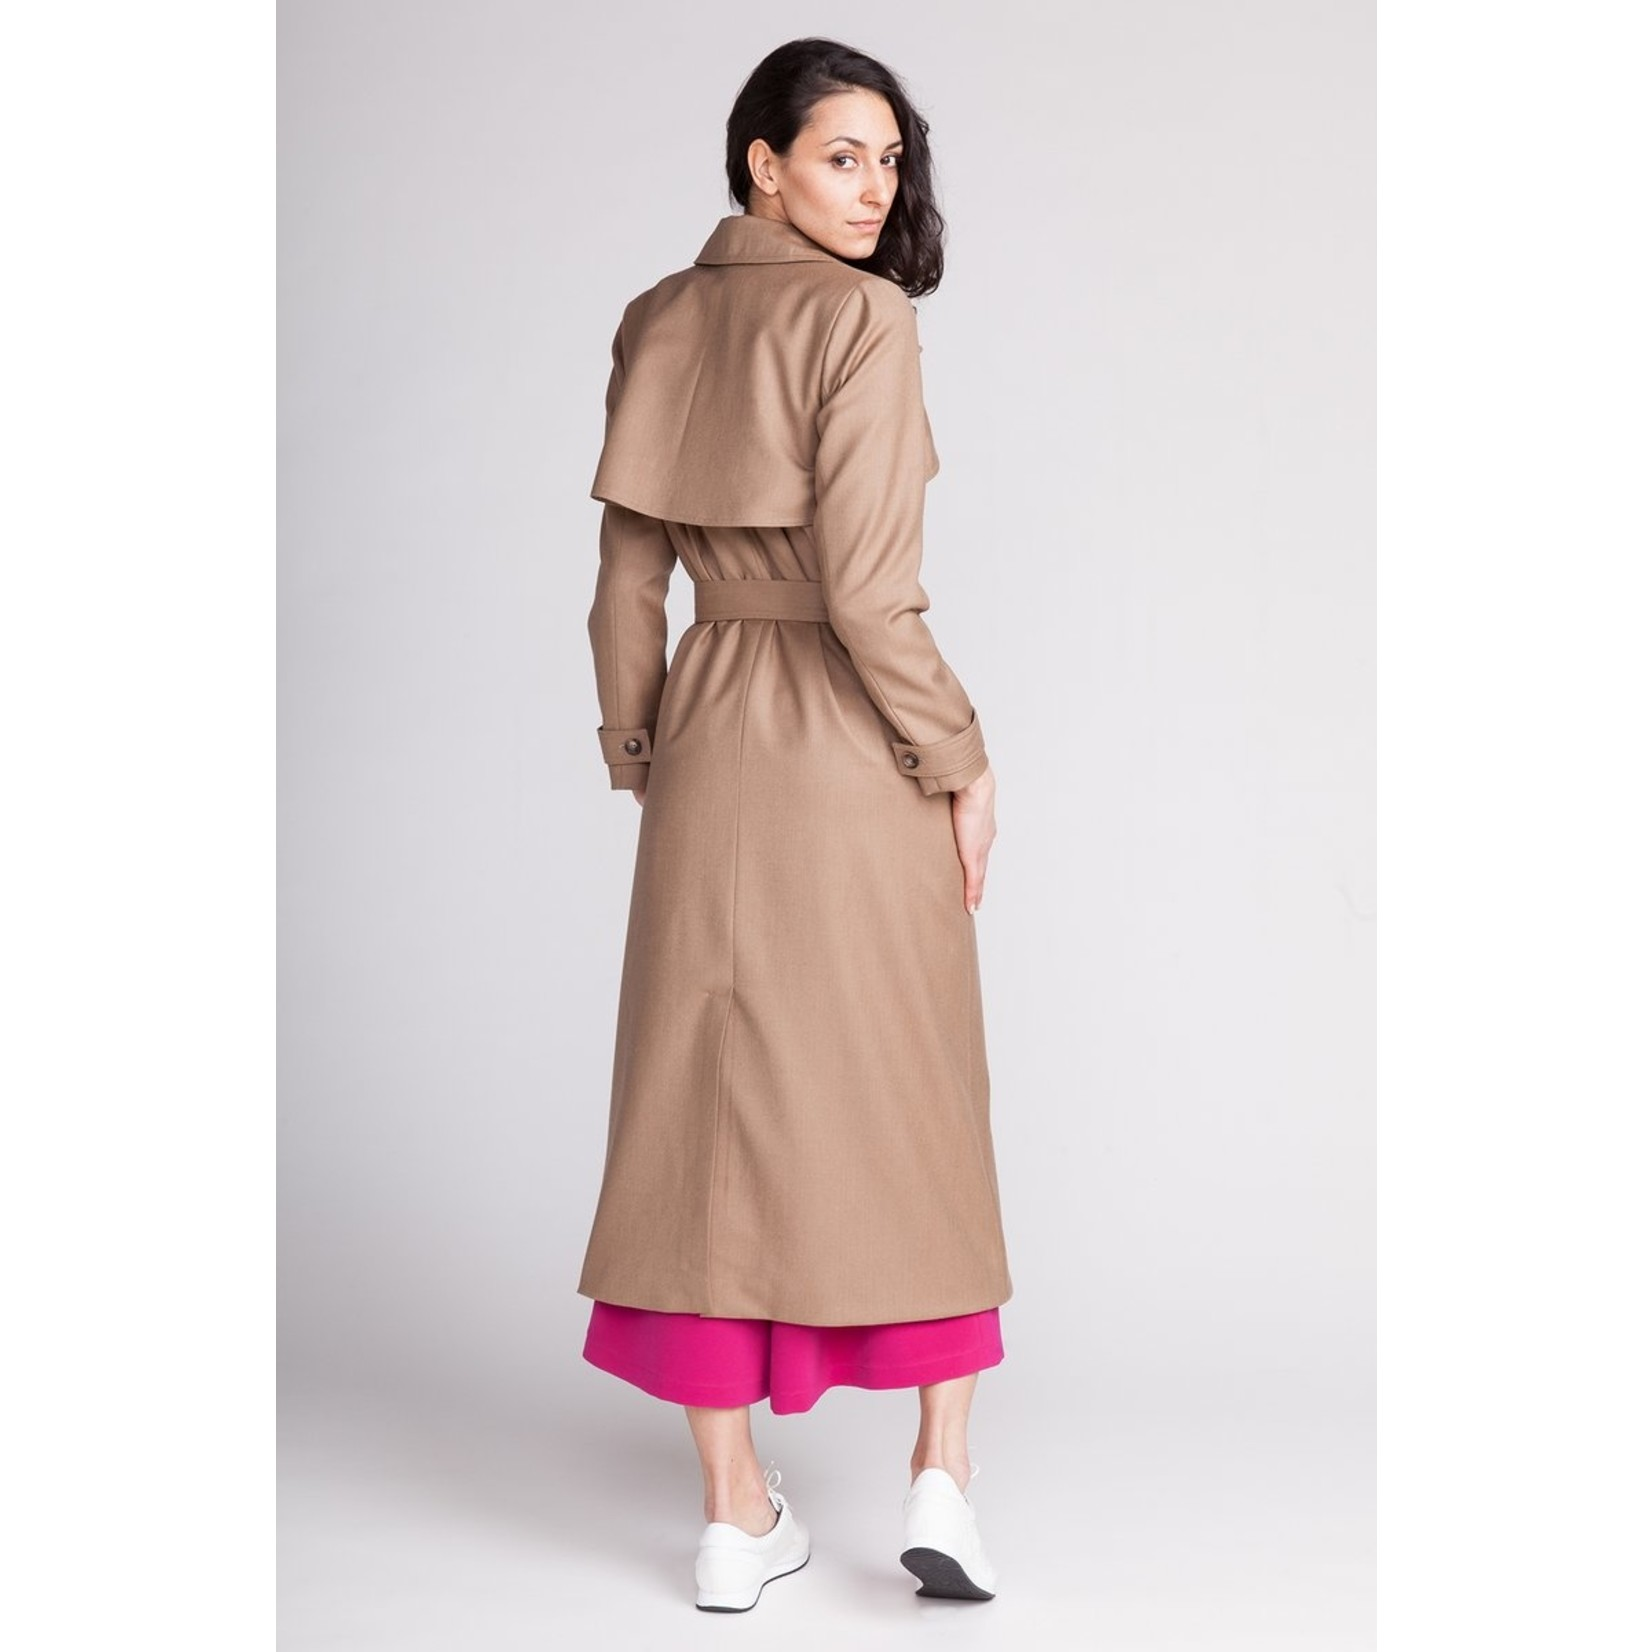 Named Clothing Isla Trench Coat Pattern 0-24